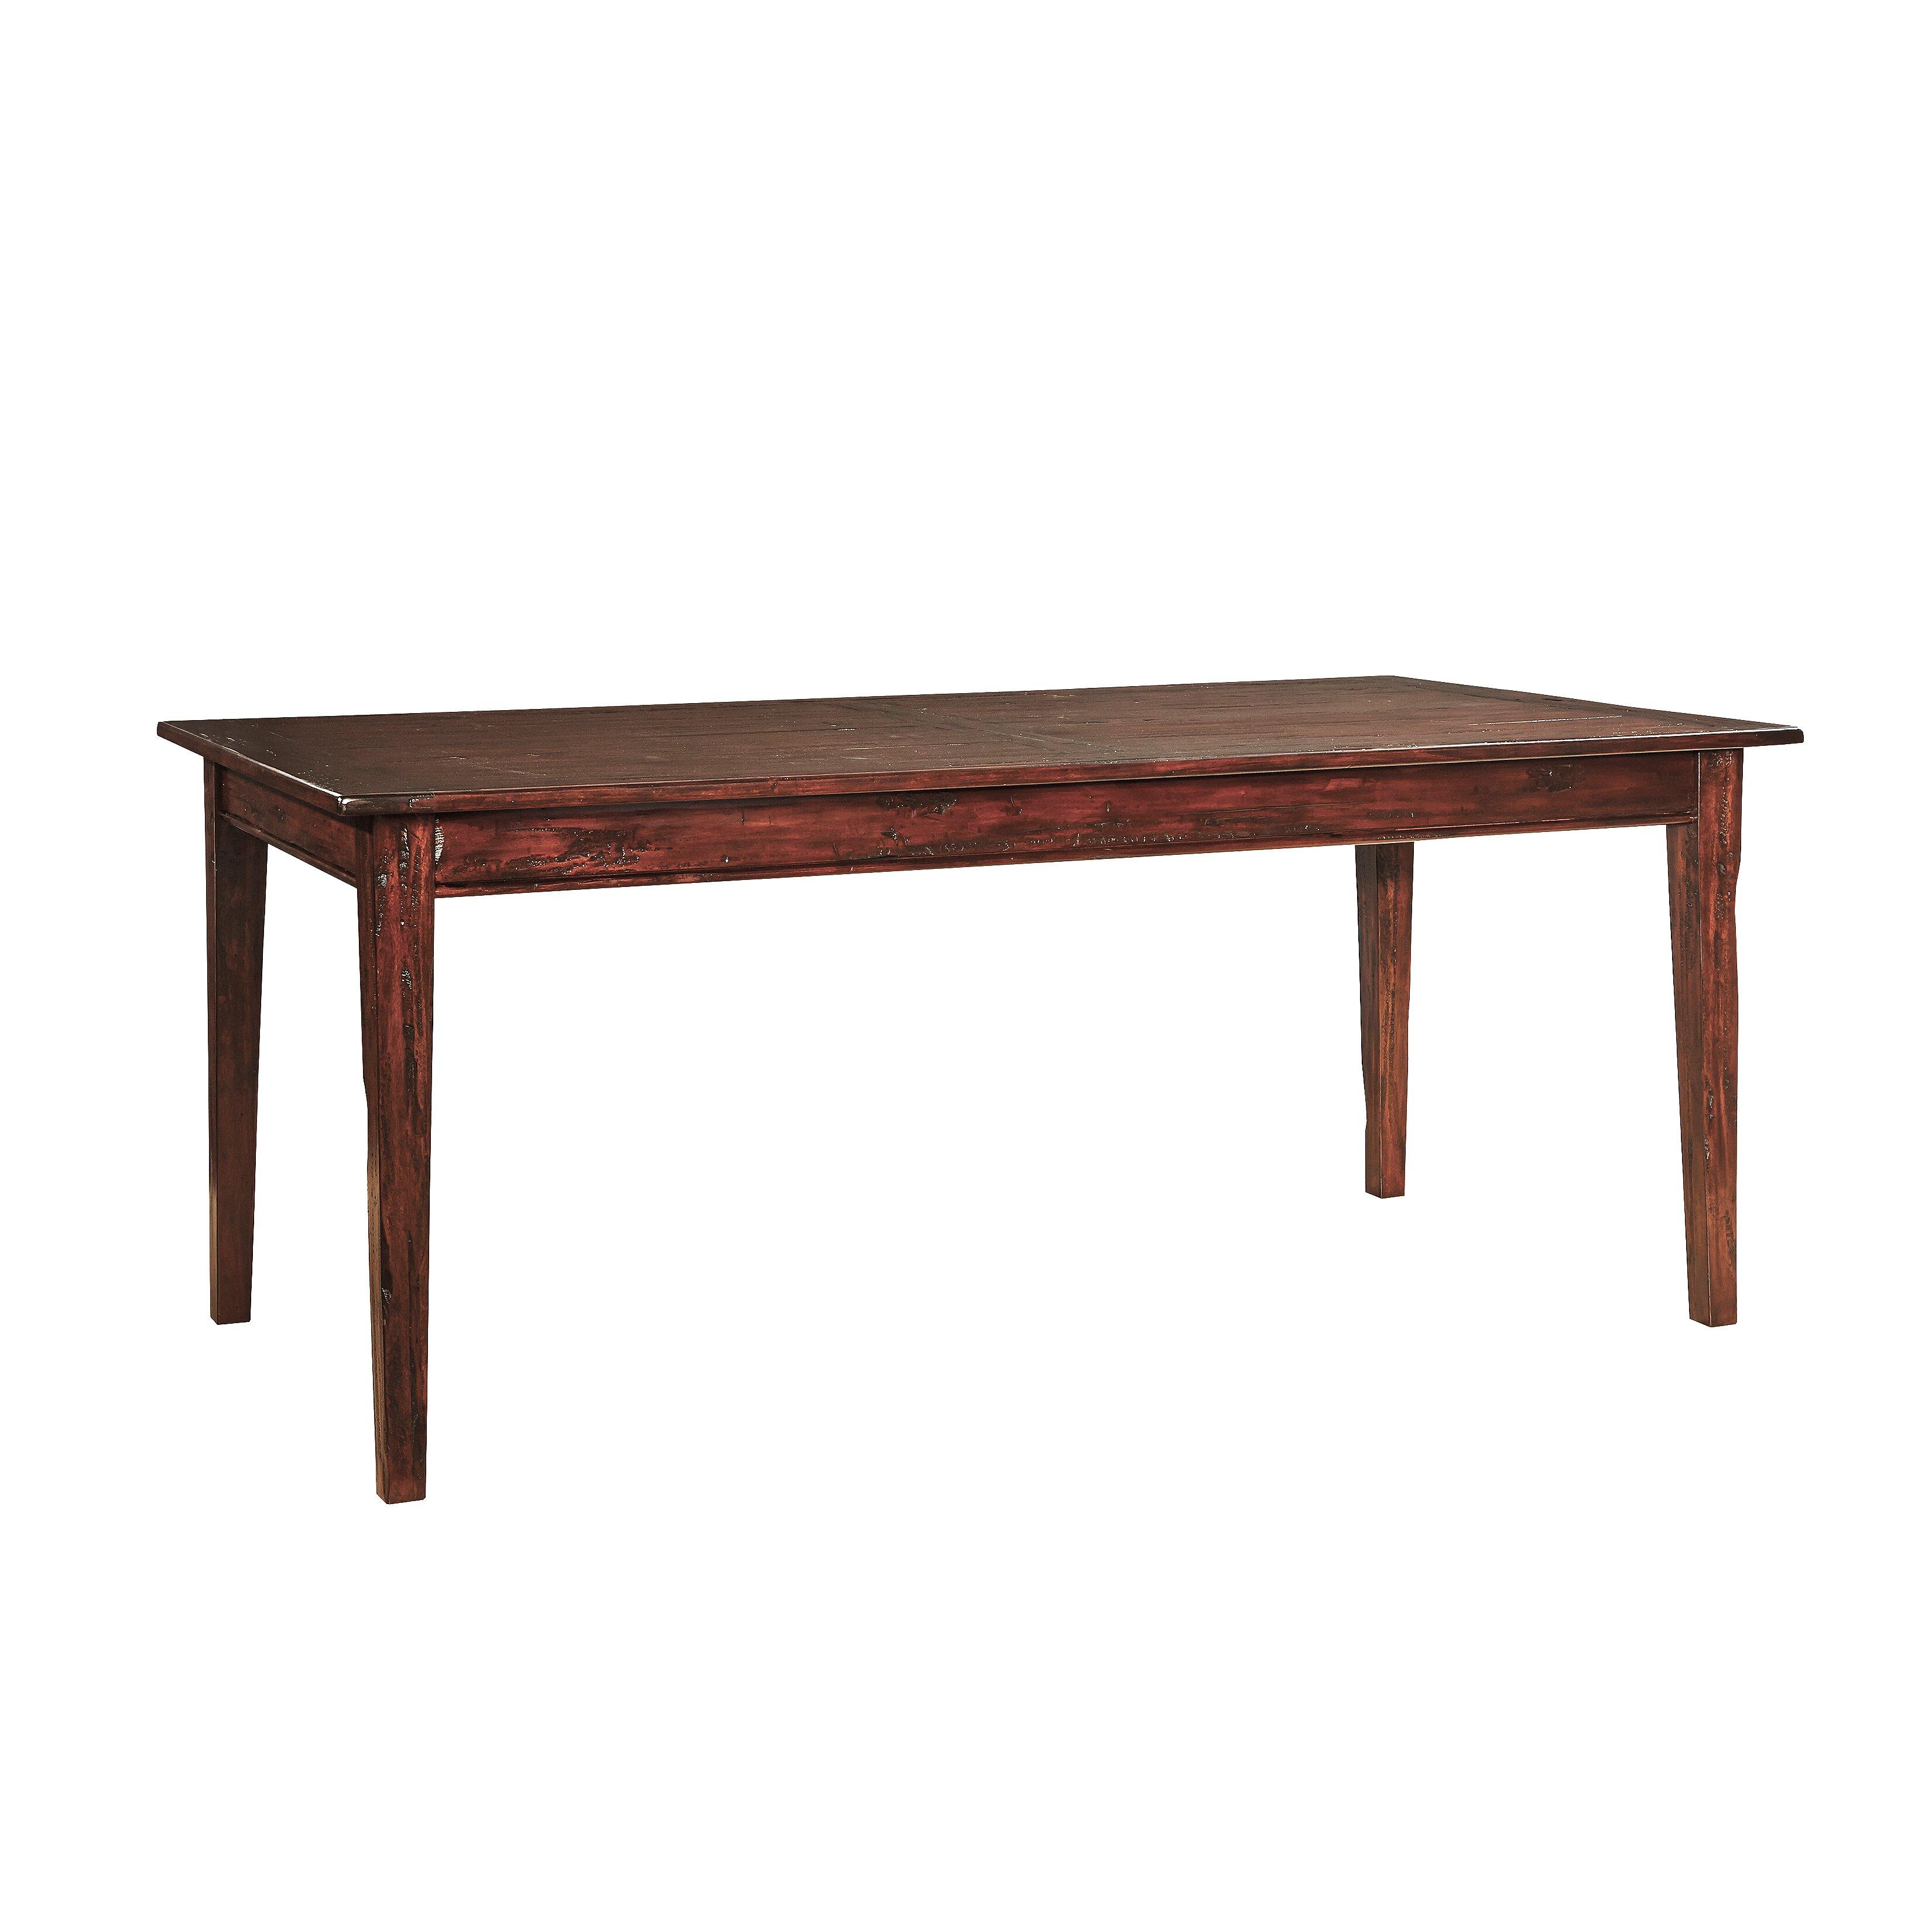 Furniture Classics Ltd Hand Planed Dining Table Allmodern